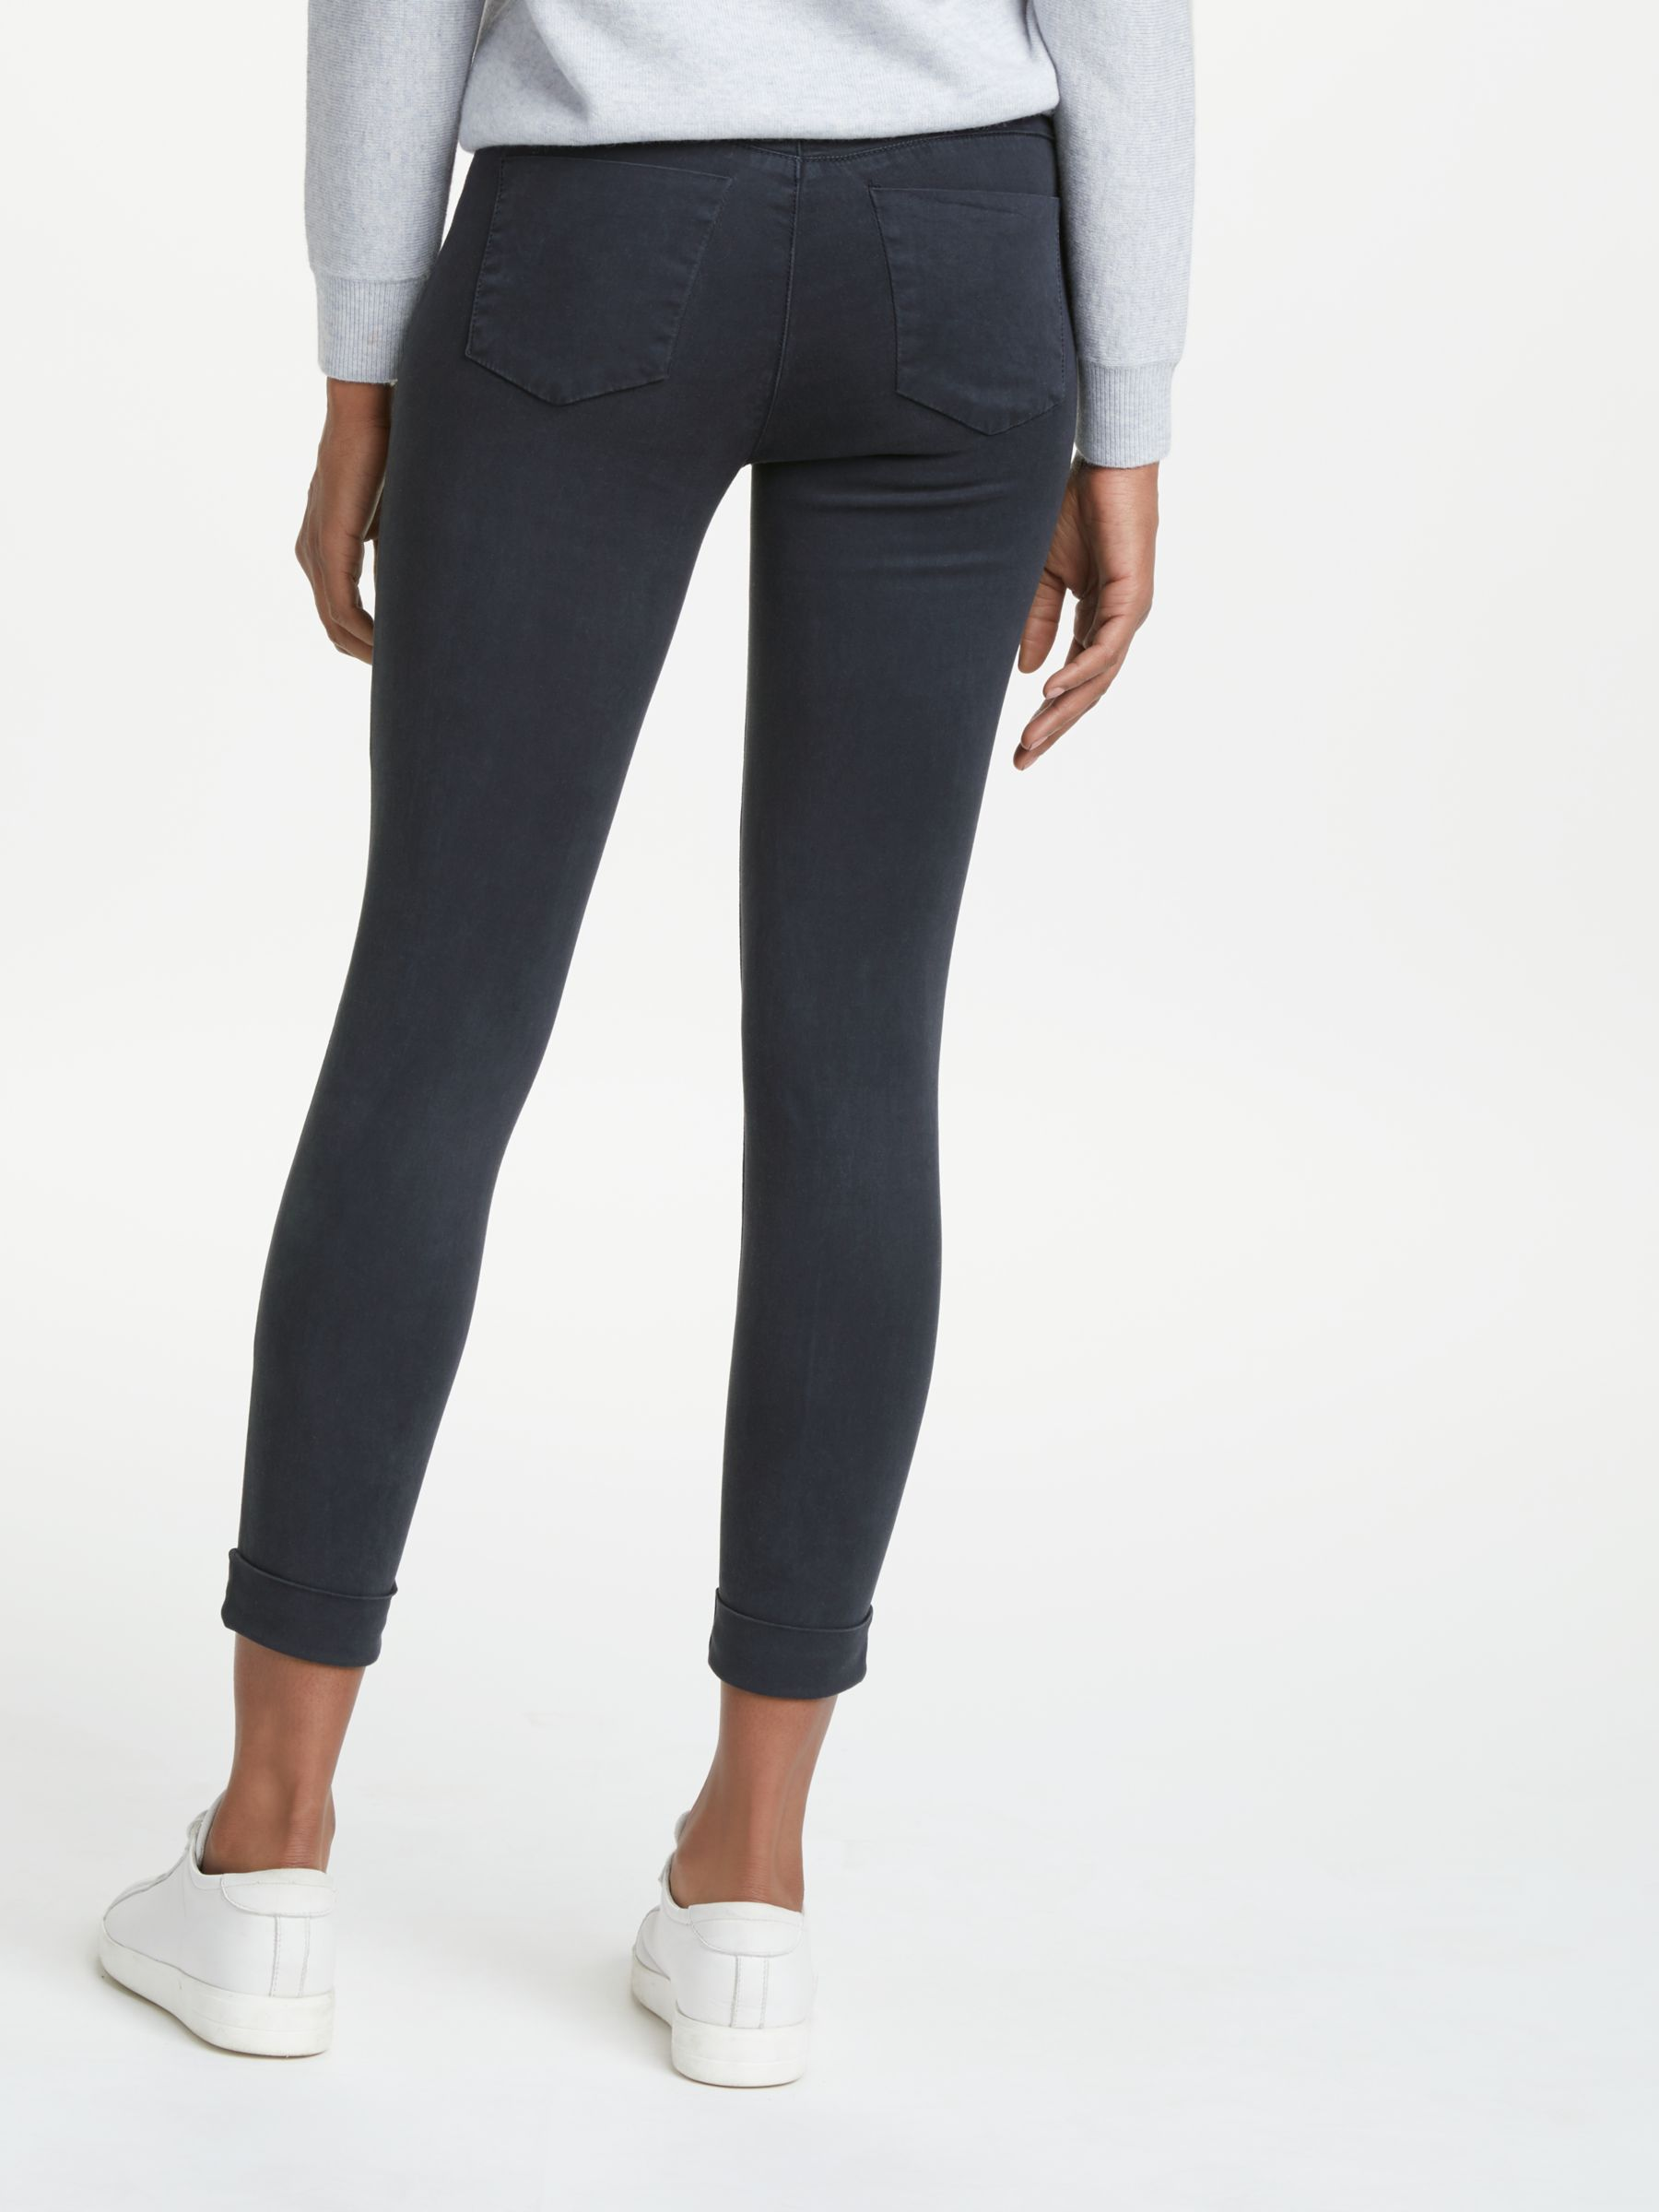 J Brand J Brand Anja Luxe Sateen Skinny Jeans, Dark Navy